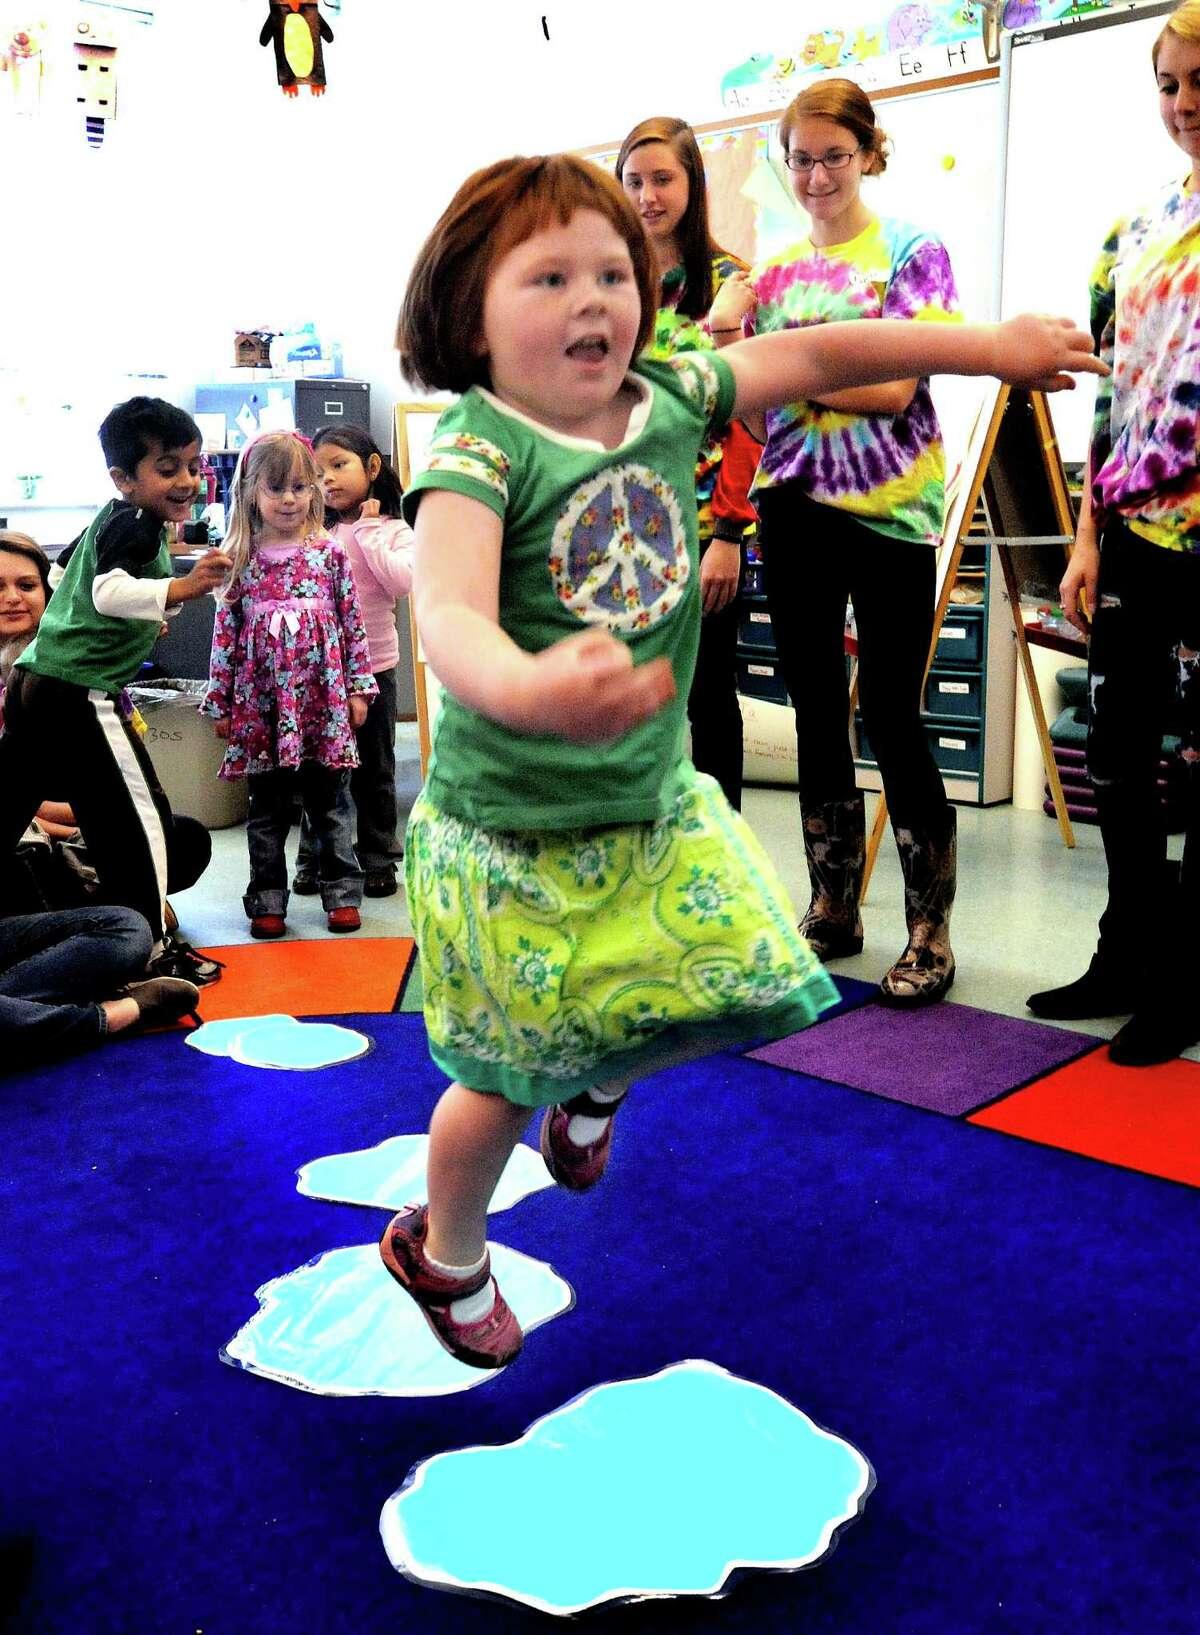 Emma Kavaneah, 5, jumps puddles during a child development class at New Milford High School Thursday, April 12, 2012.